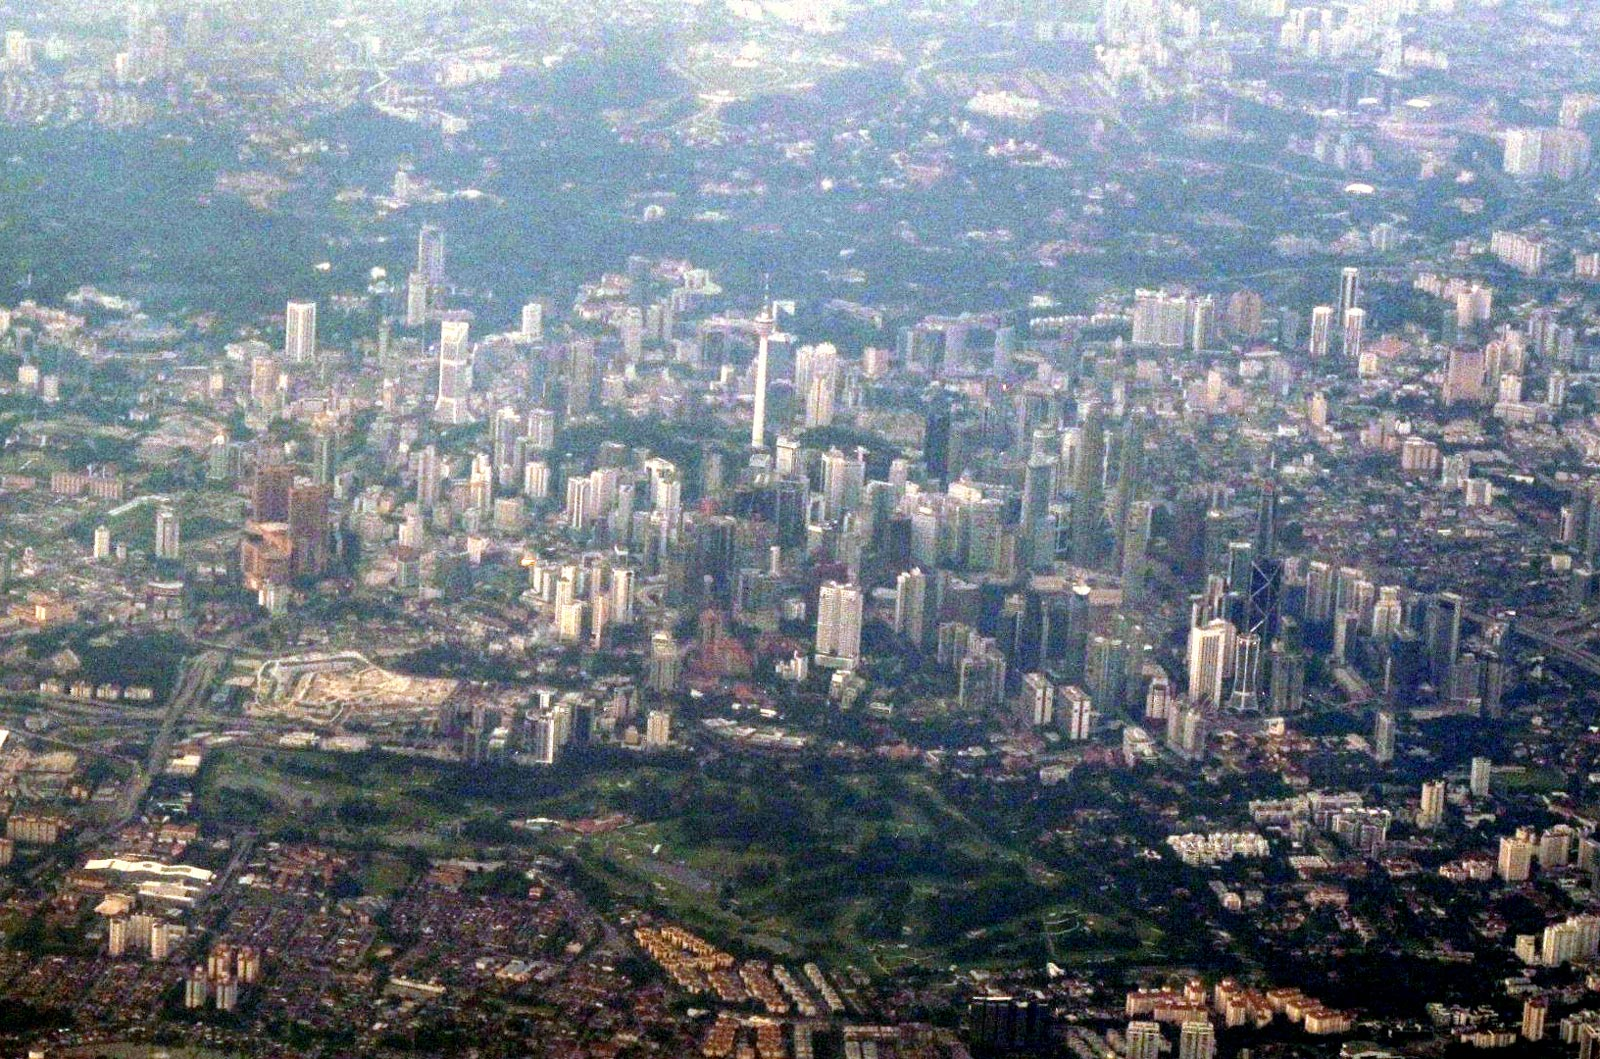 Центр города Куала-Лумпур с телебашней Menara Kuala Lumpur